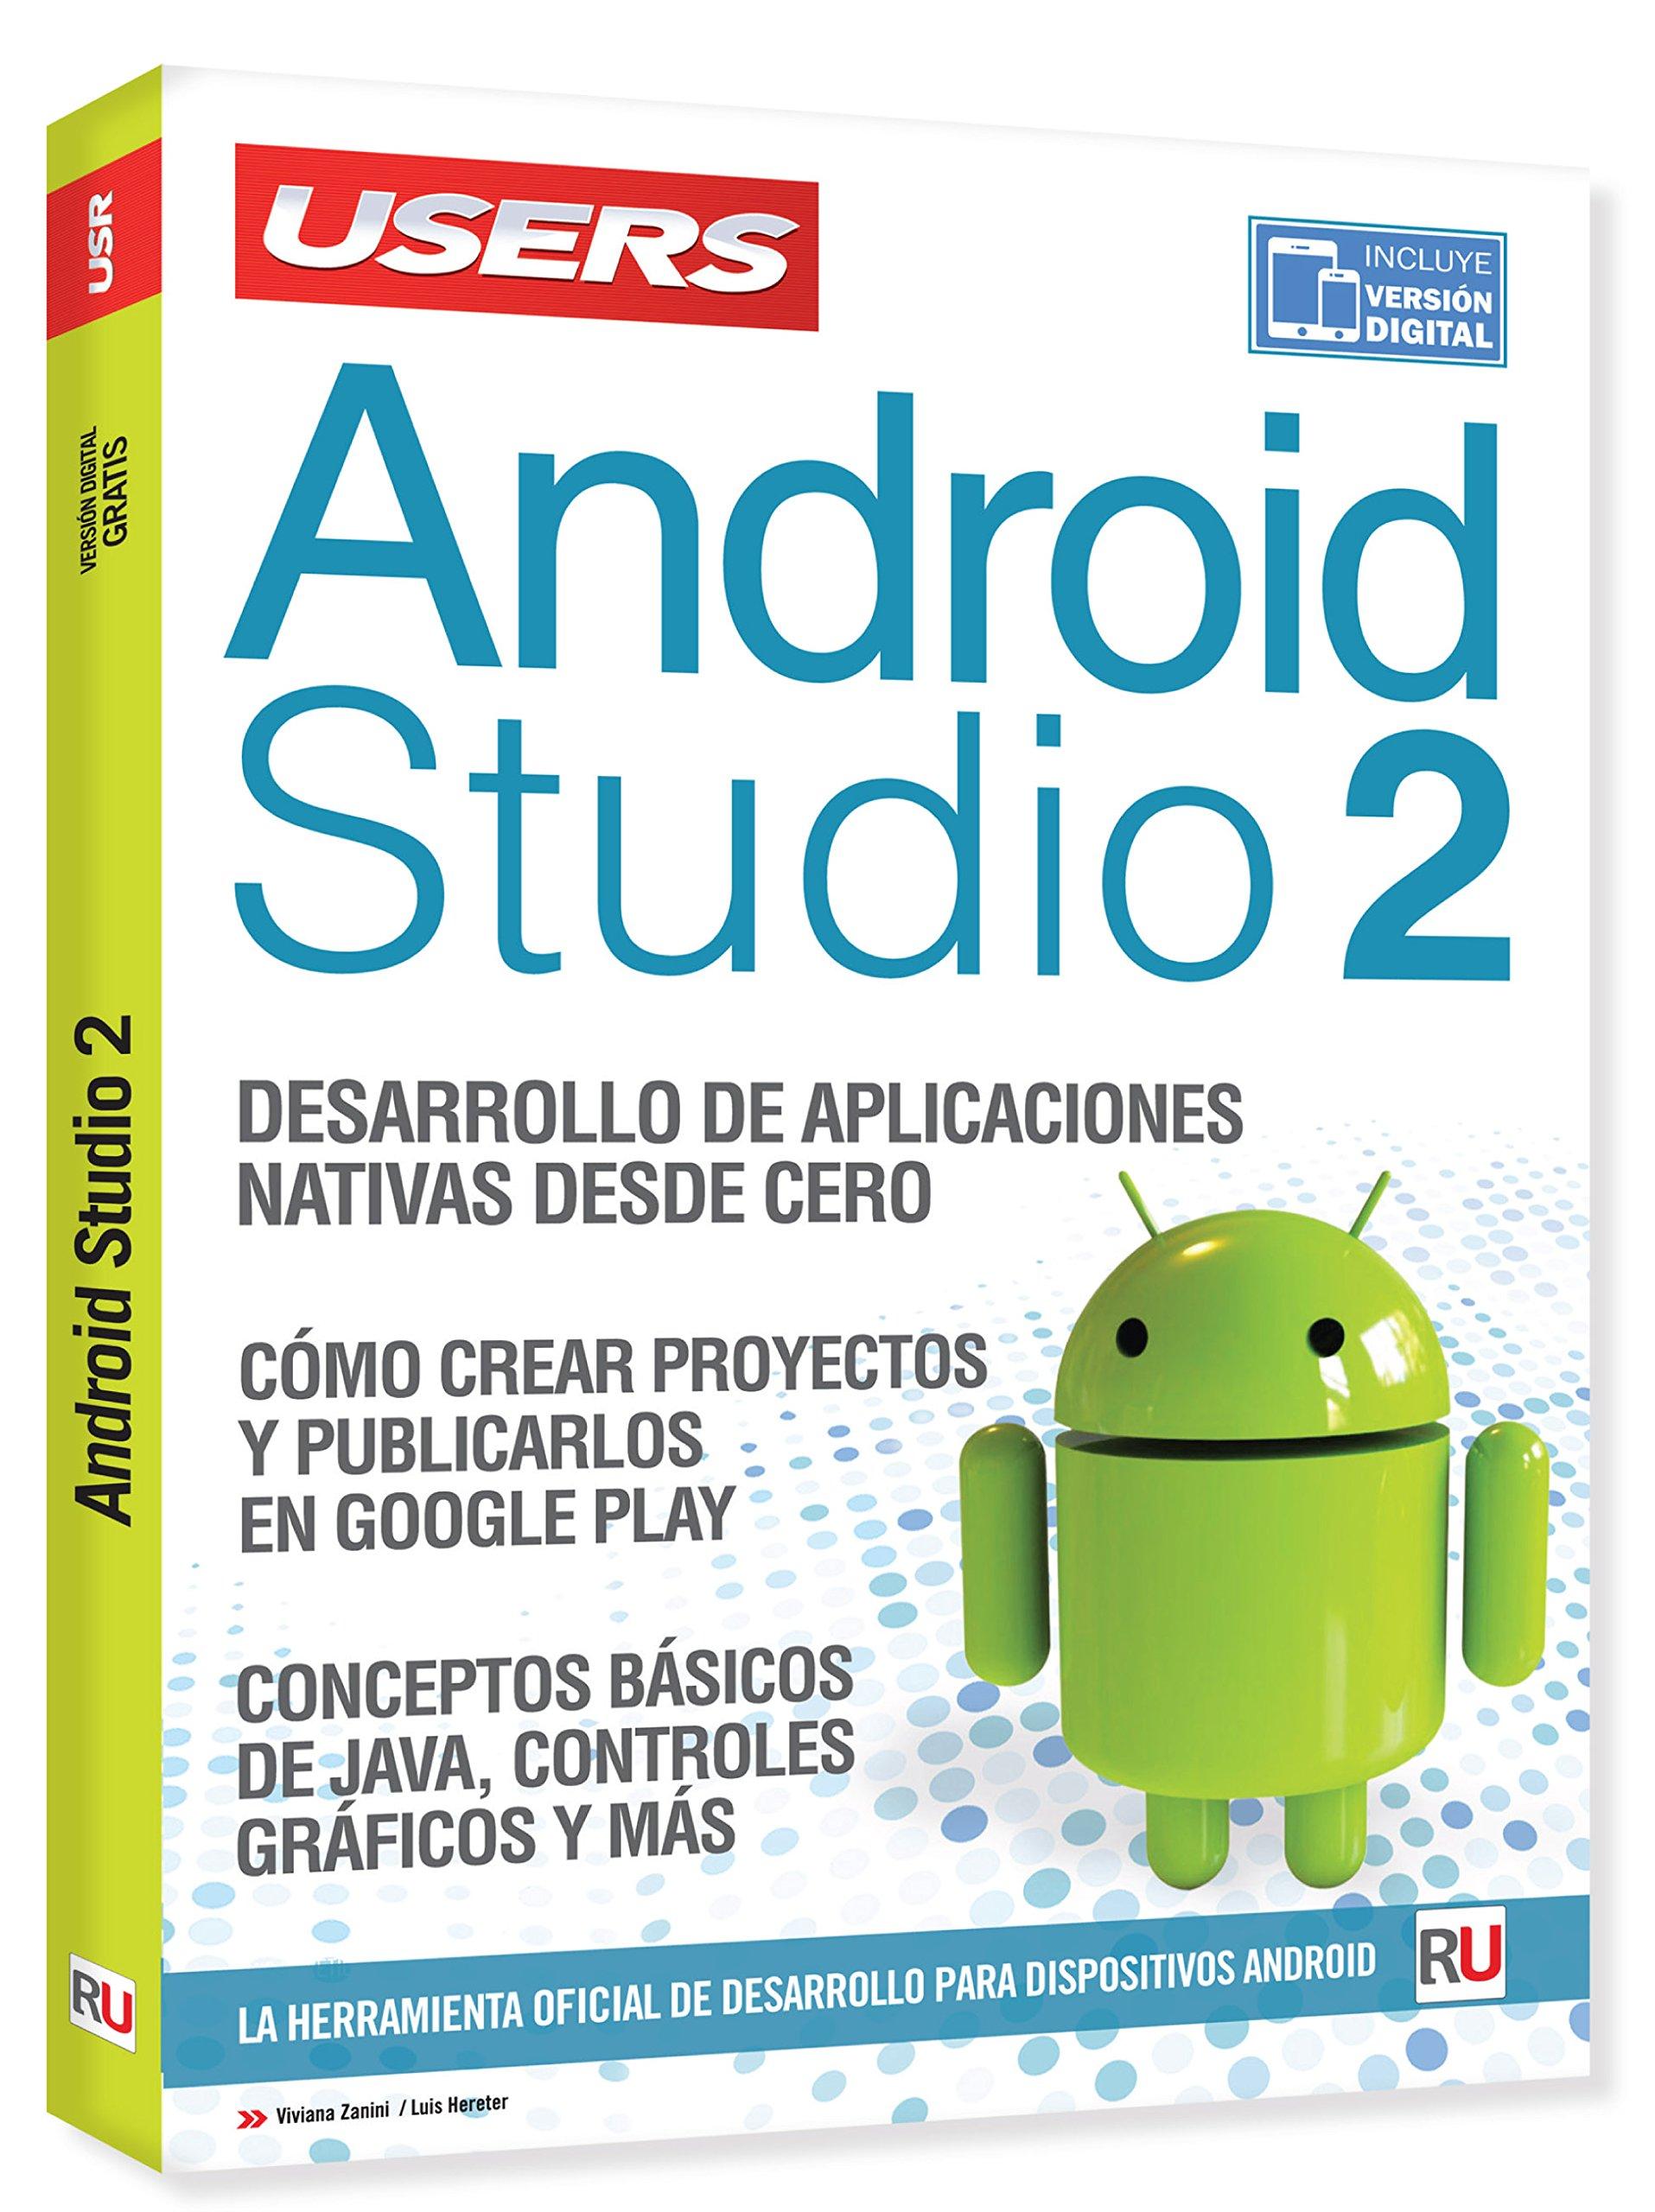 Android Studio 2 (Spanish Edition): Viviana Zanini, Luis Hereter, USERS, Español Espanol Espaniol, Desarrollo Aplicaciones Google play Android Java: ...